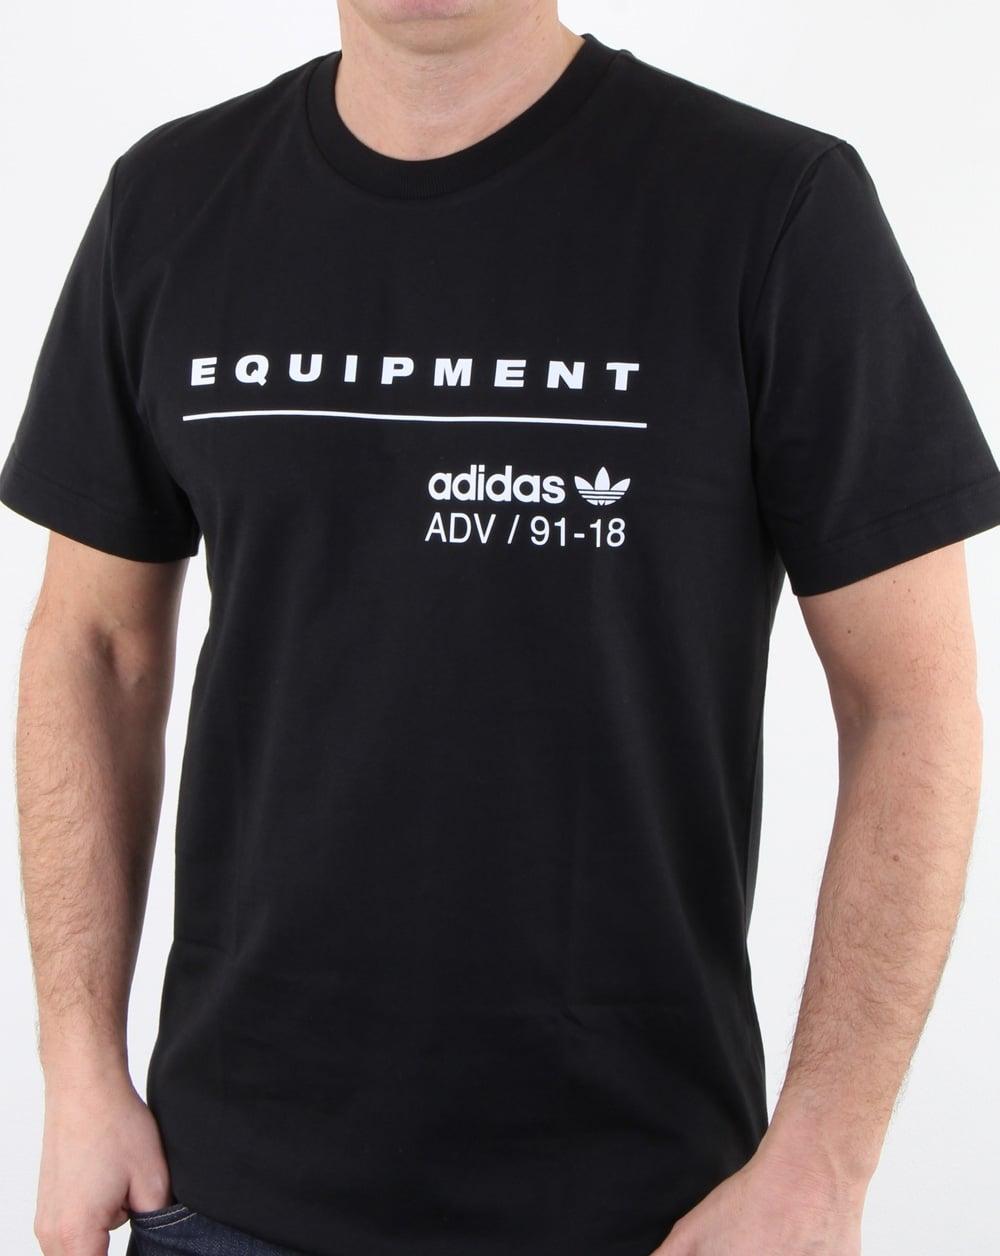 Adidas originals pdx classic t shirt black mens cotton for Adidas classic t shirt